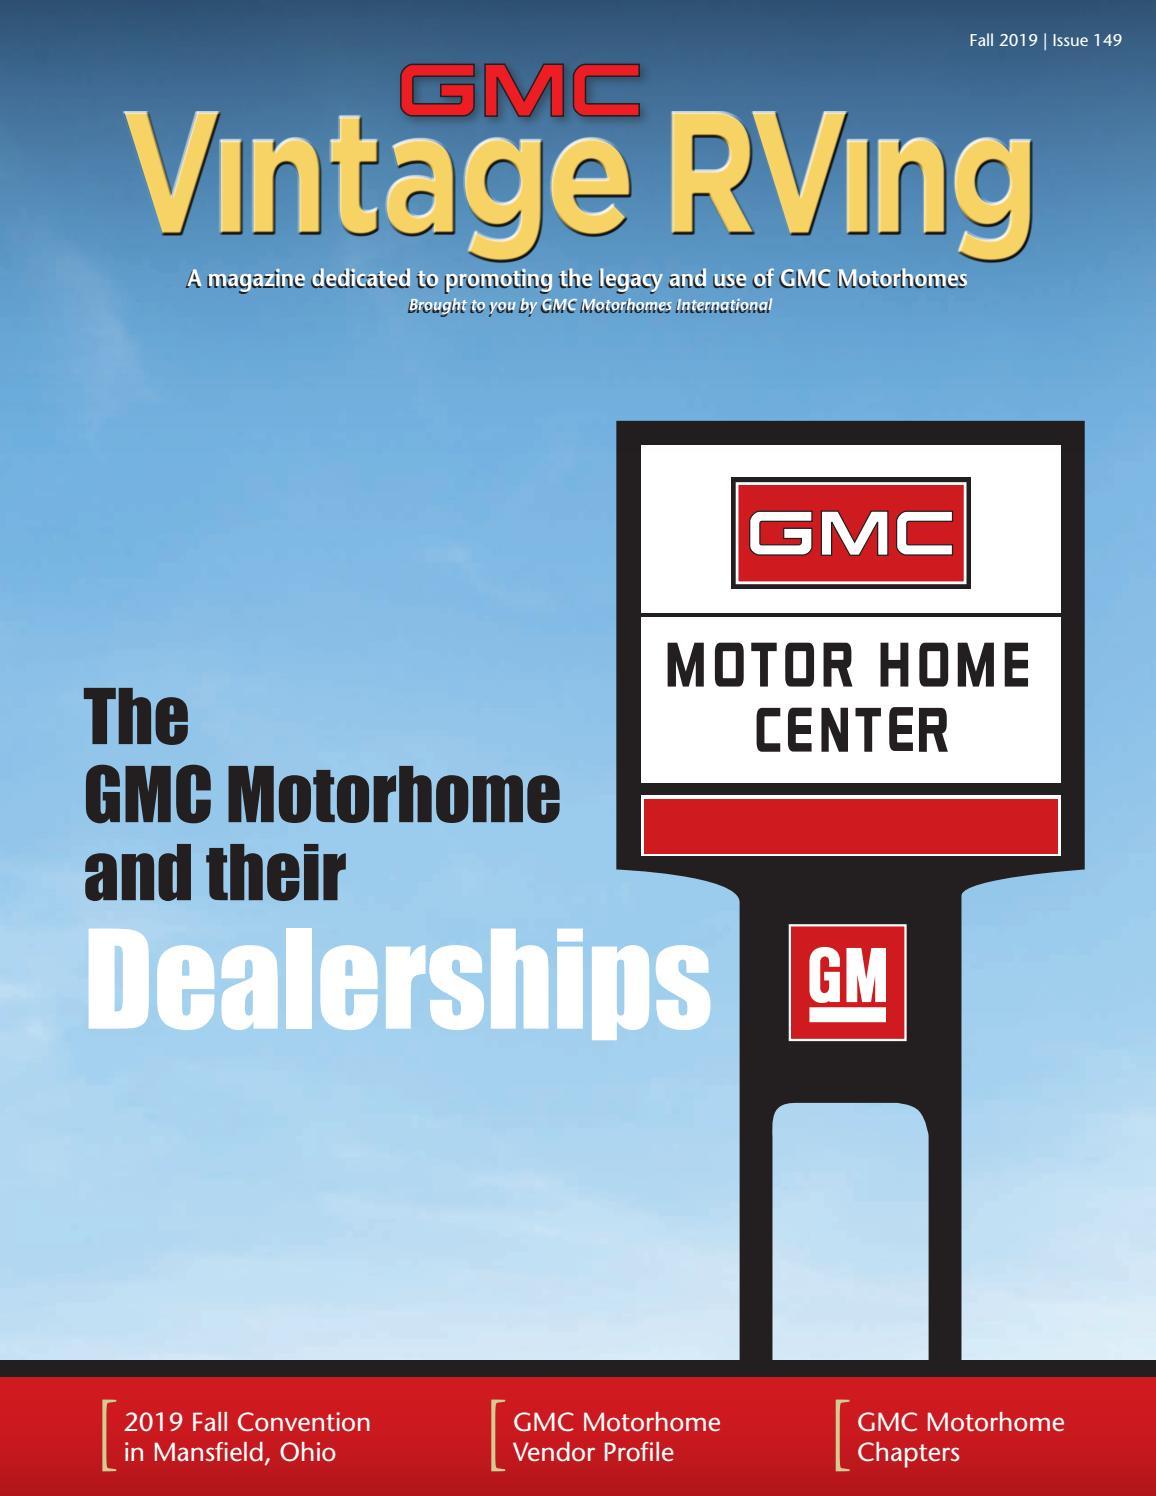 honda ev6010 wiring diagram gmc vintage rving magazine fall 2019 by ceva design issuu  gmc vintage rving magazine fall 2019